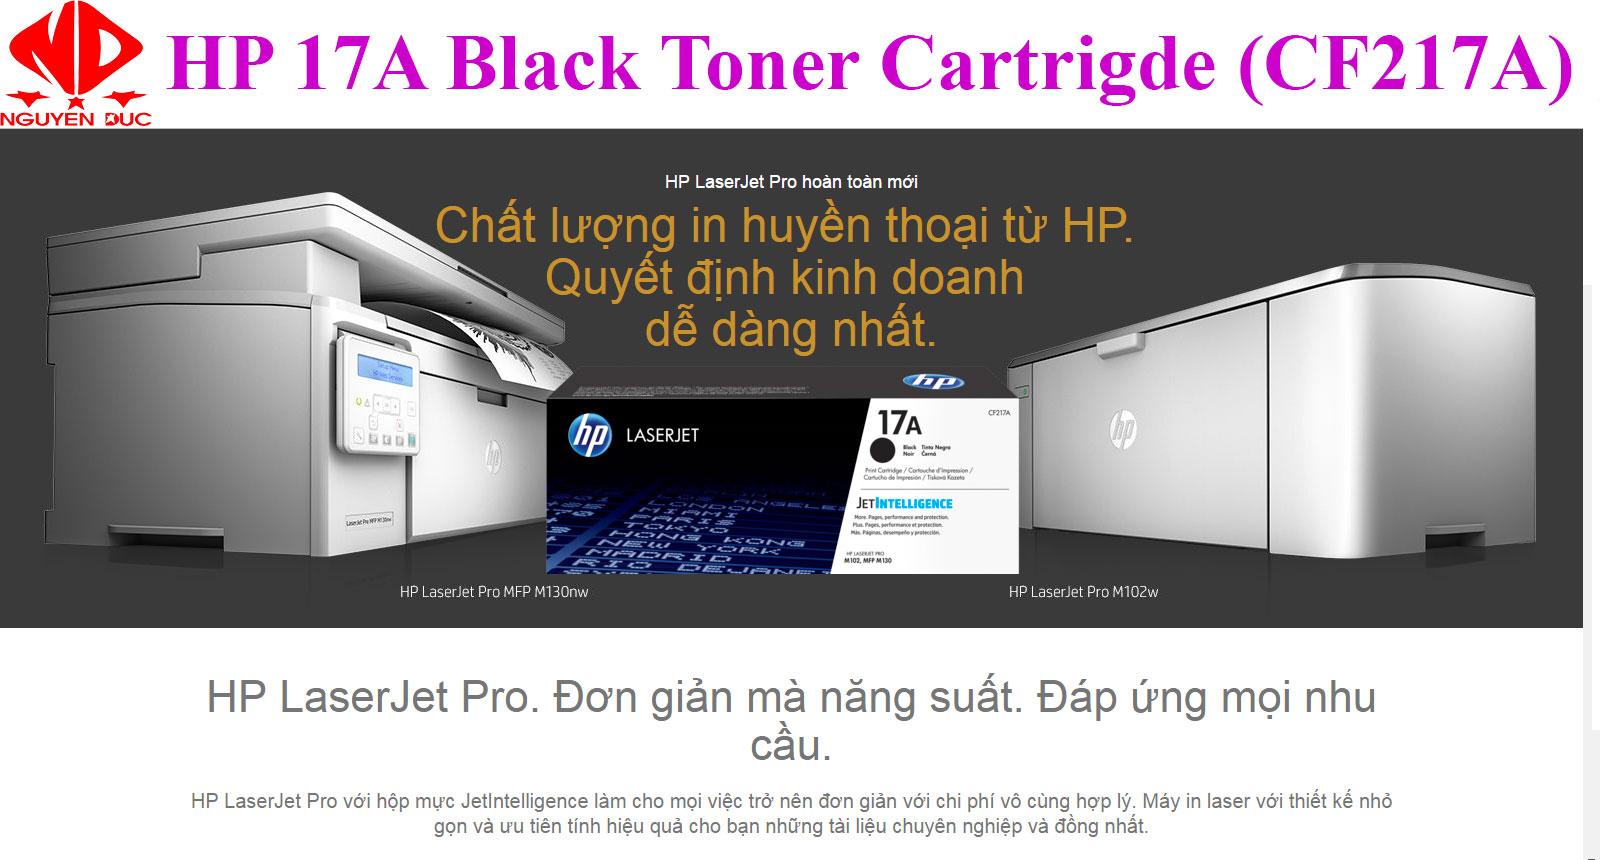 Bao Gia Muc In Cf217a Dung Cho May Hp Laserjet Pro Mfp M130a Bo Printer Gi Mc Dng My